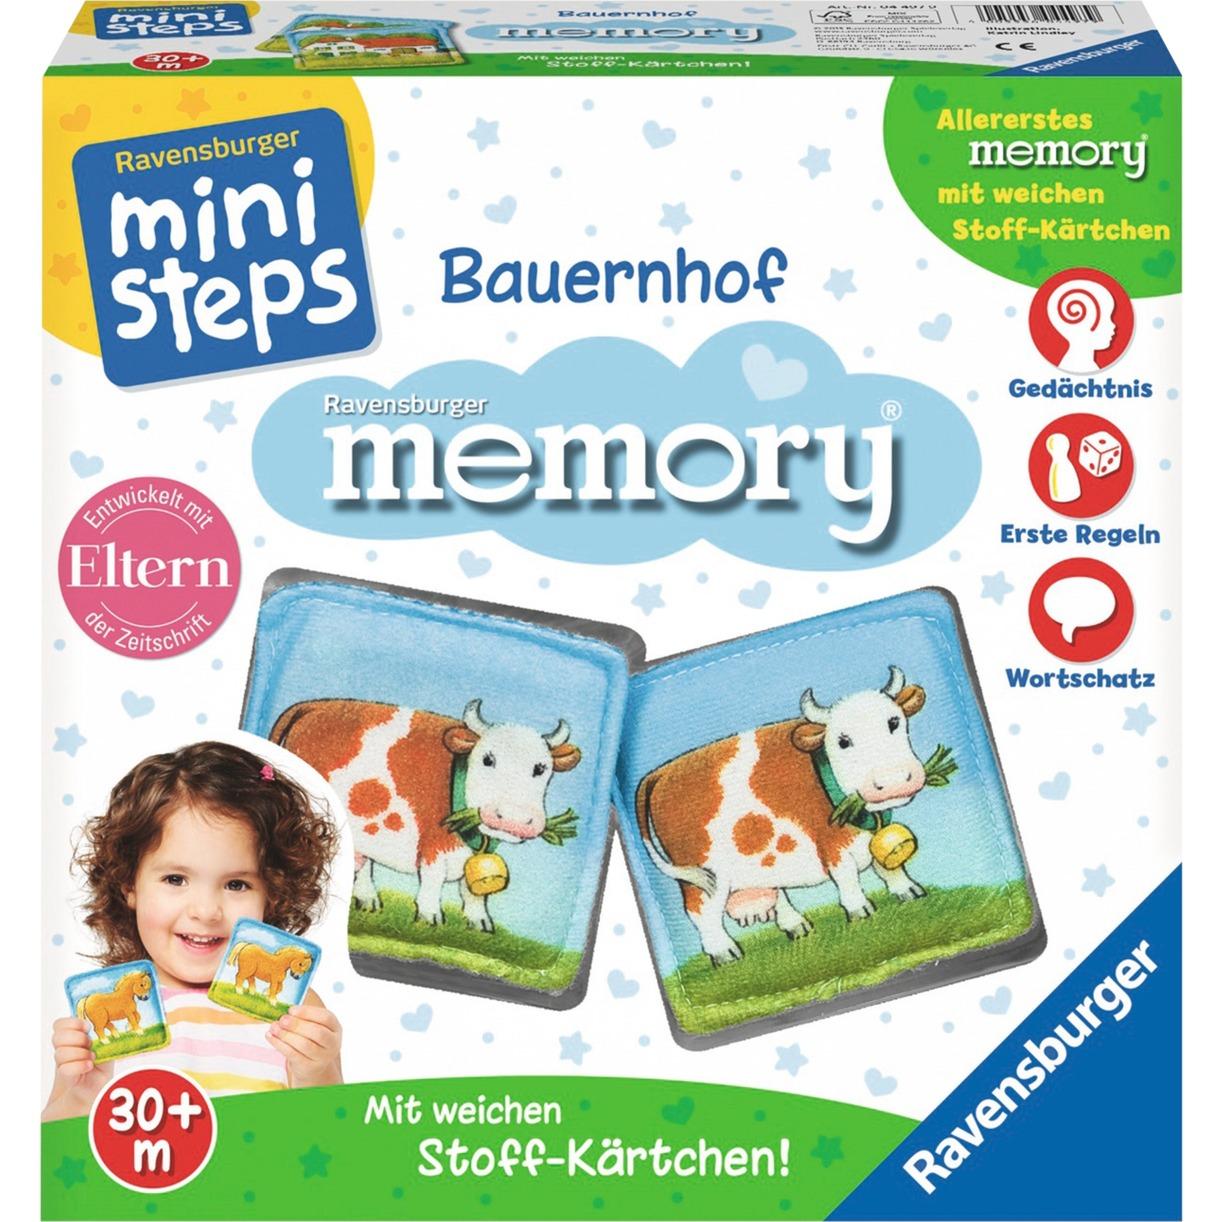 ministeps-bauernhof-memory-hukommelse-spil-memory